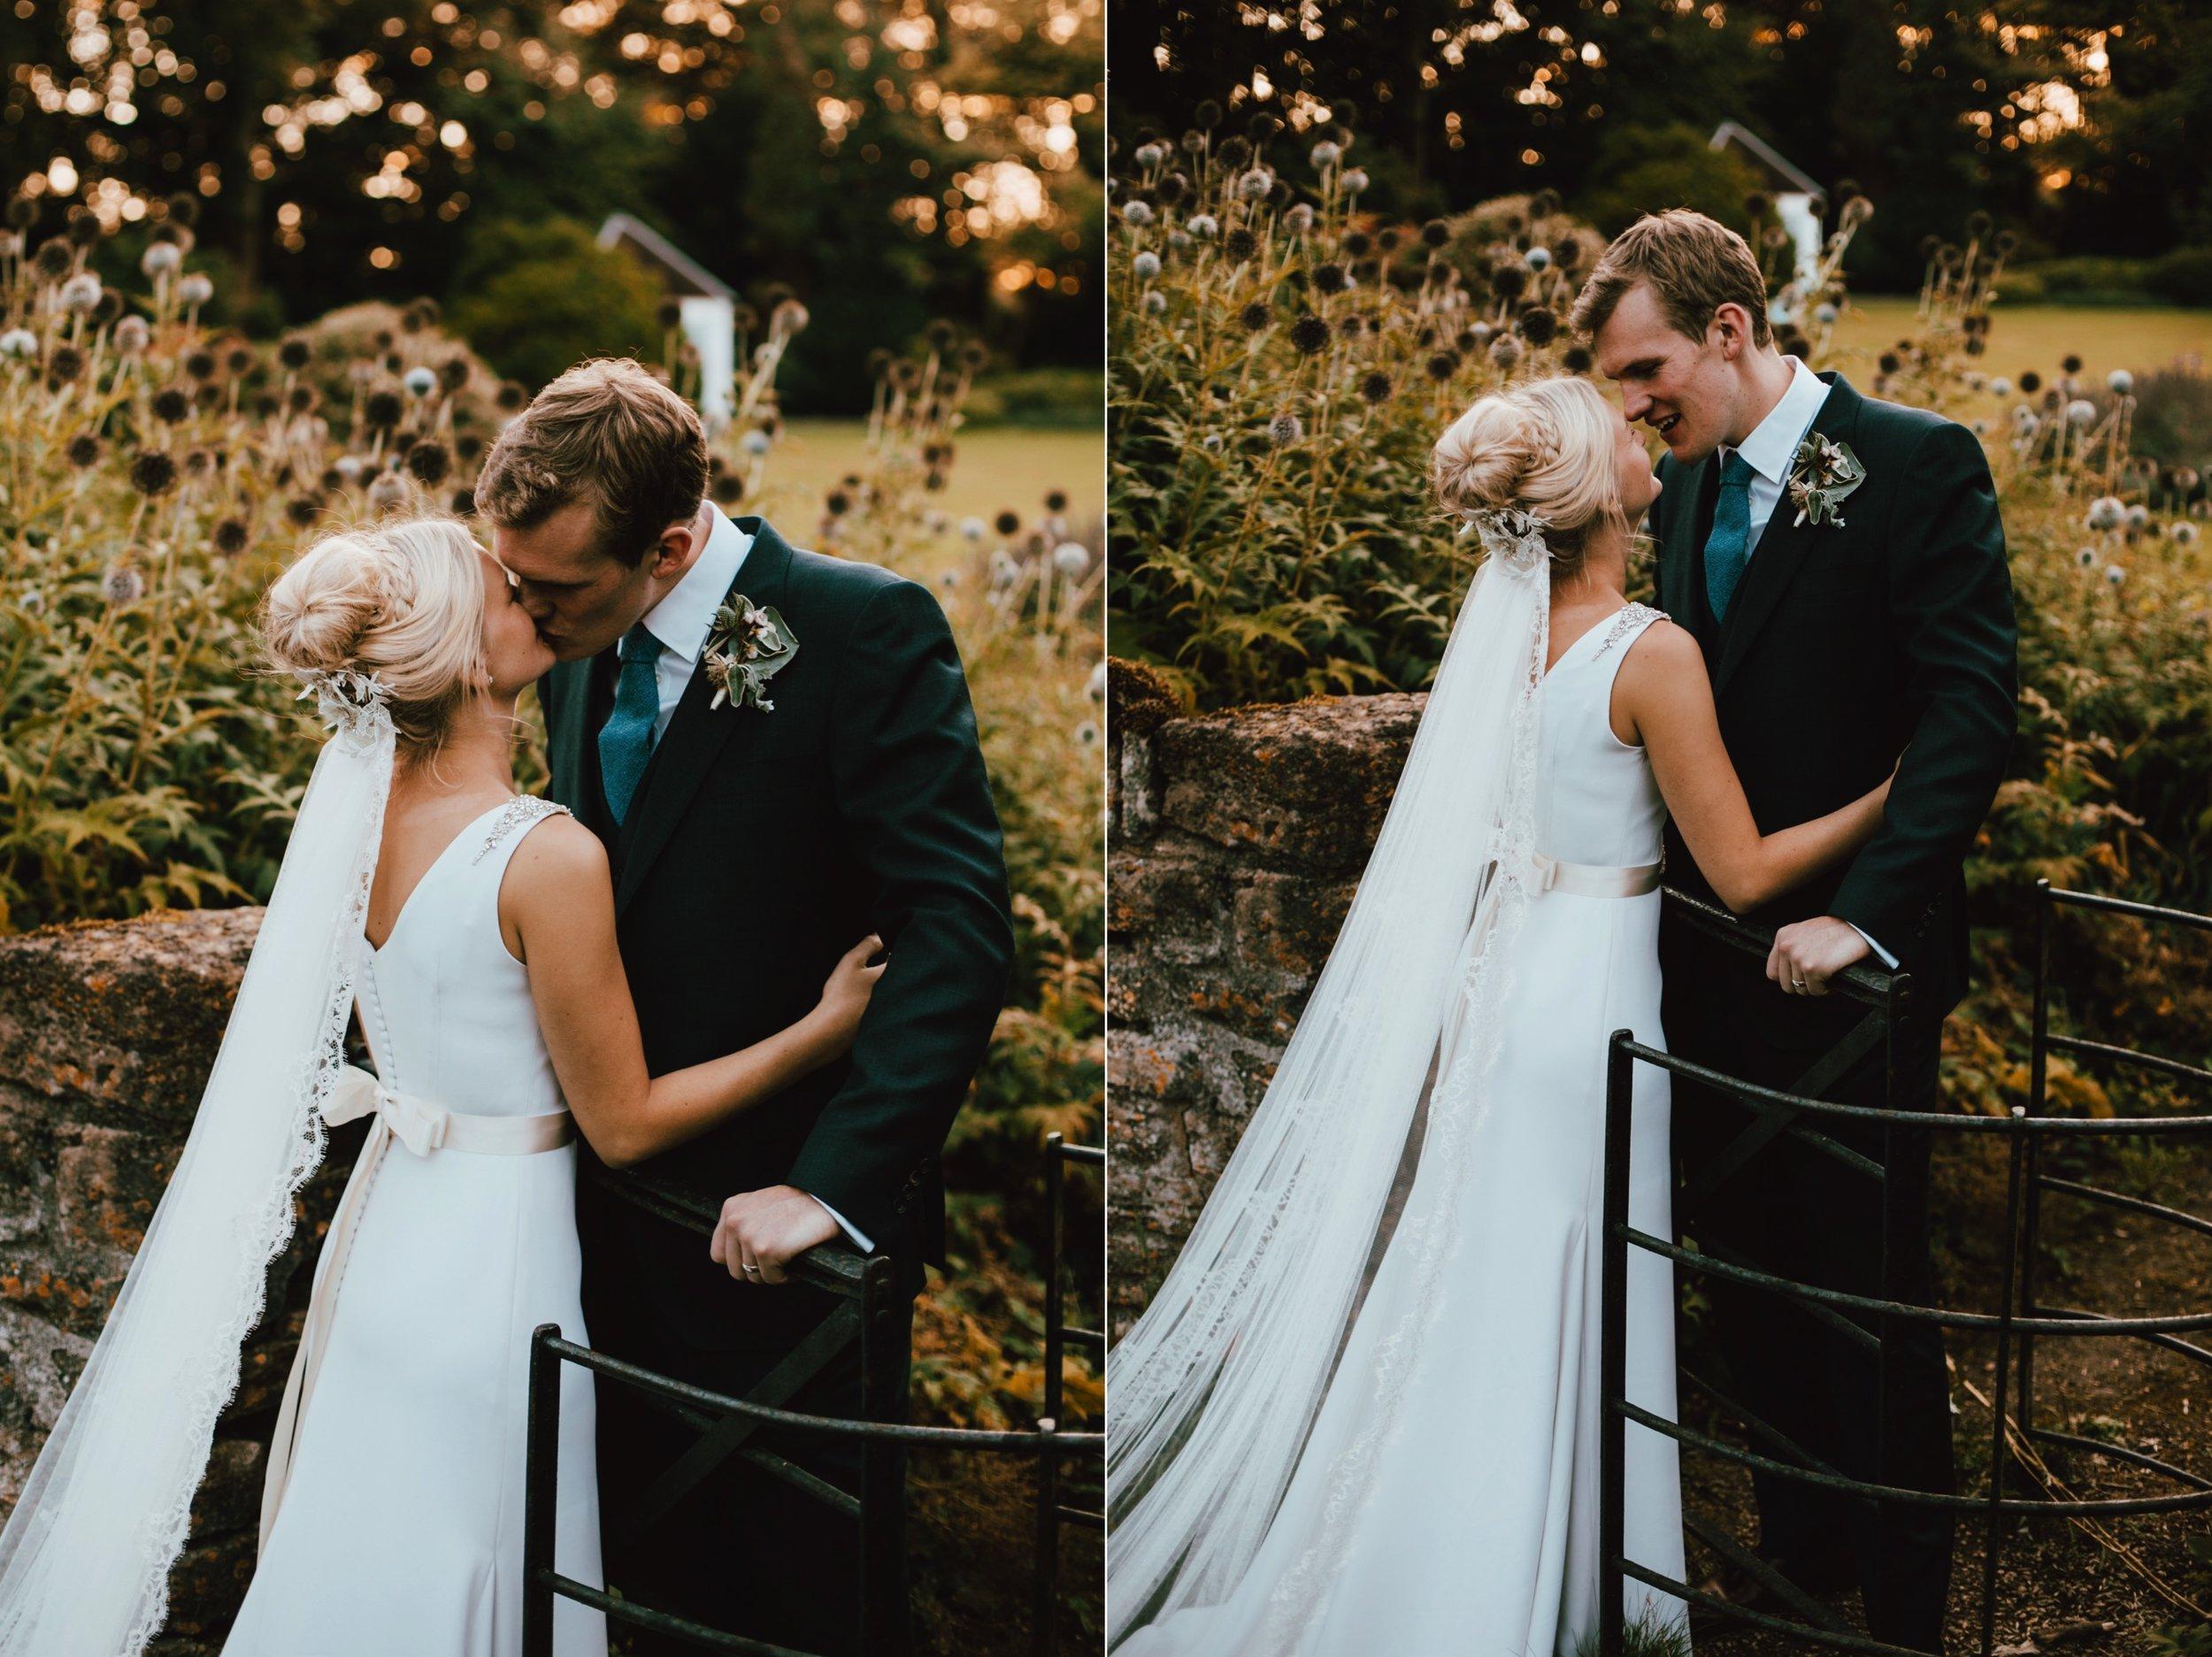 James & Hannah - Oak & Blossom0010.jpg